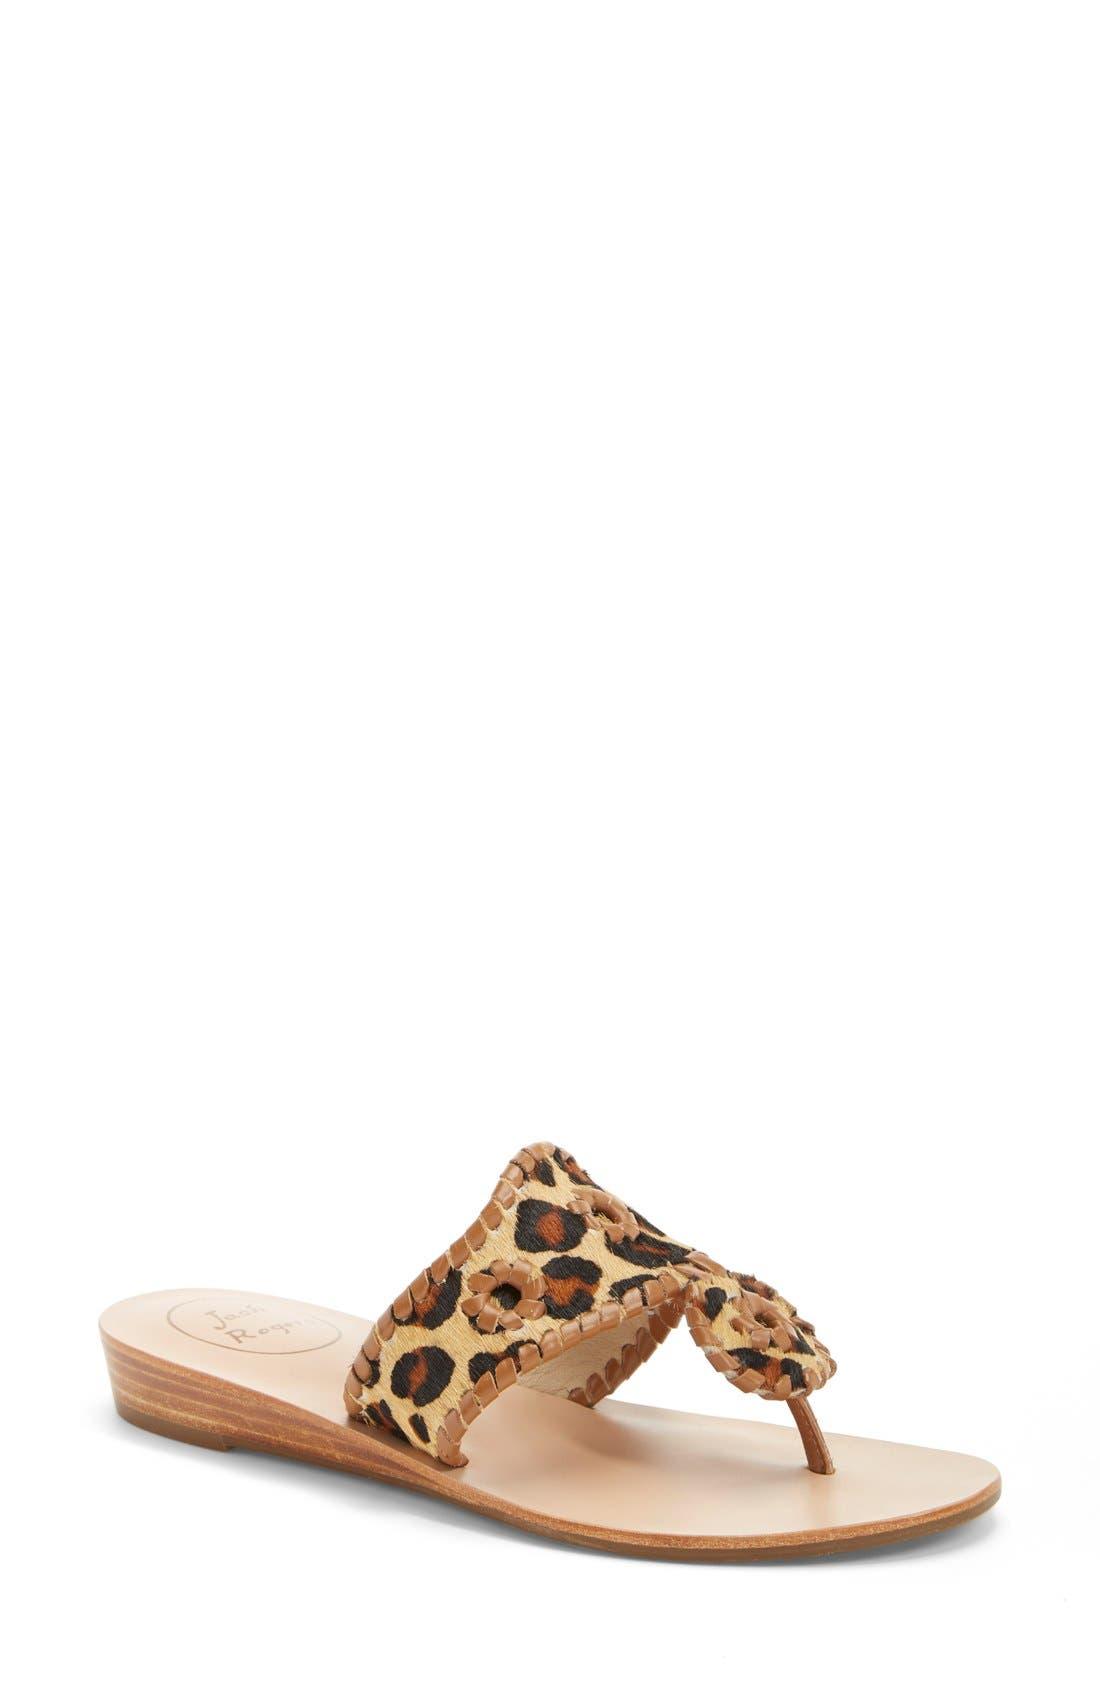 'Safari Capri' Sandal, Main, color, Leopard. '